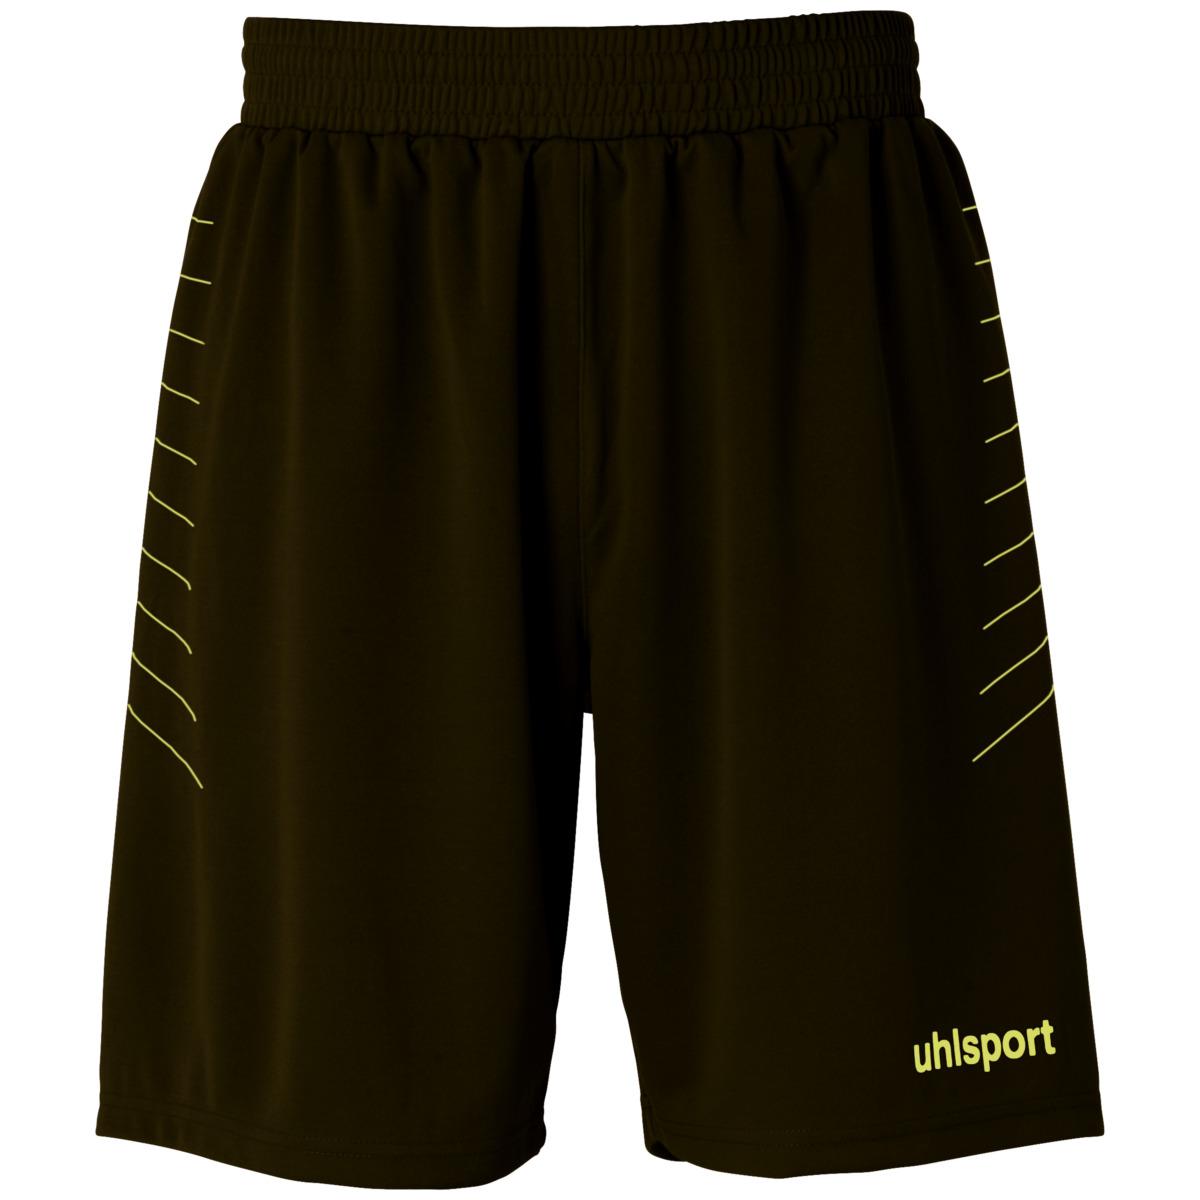 UHLSPORT MATCH GK Shorts